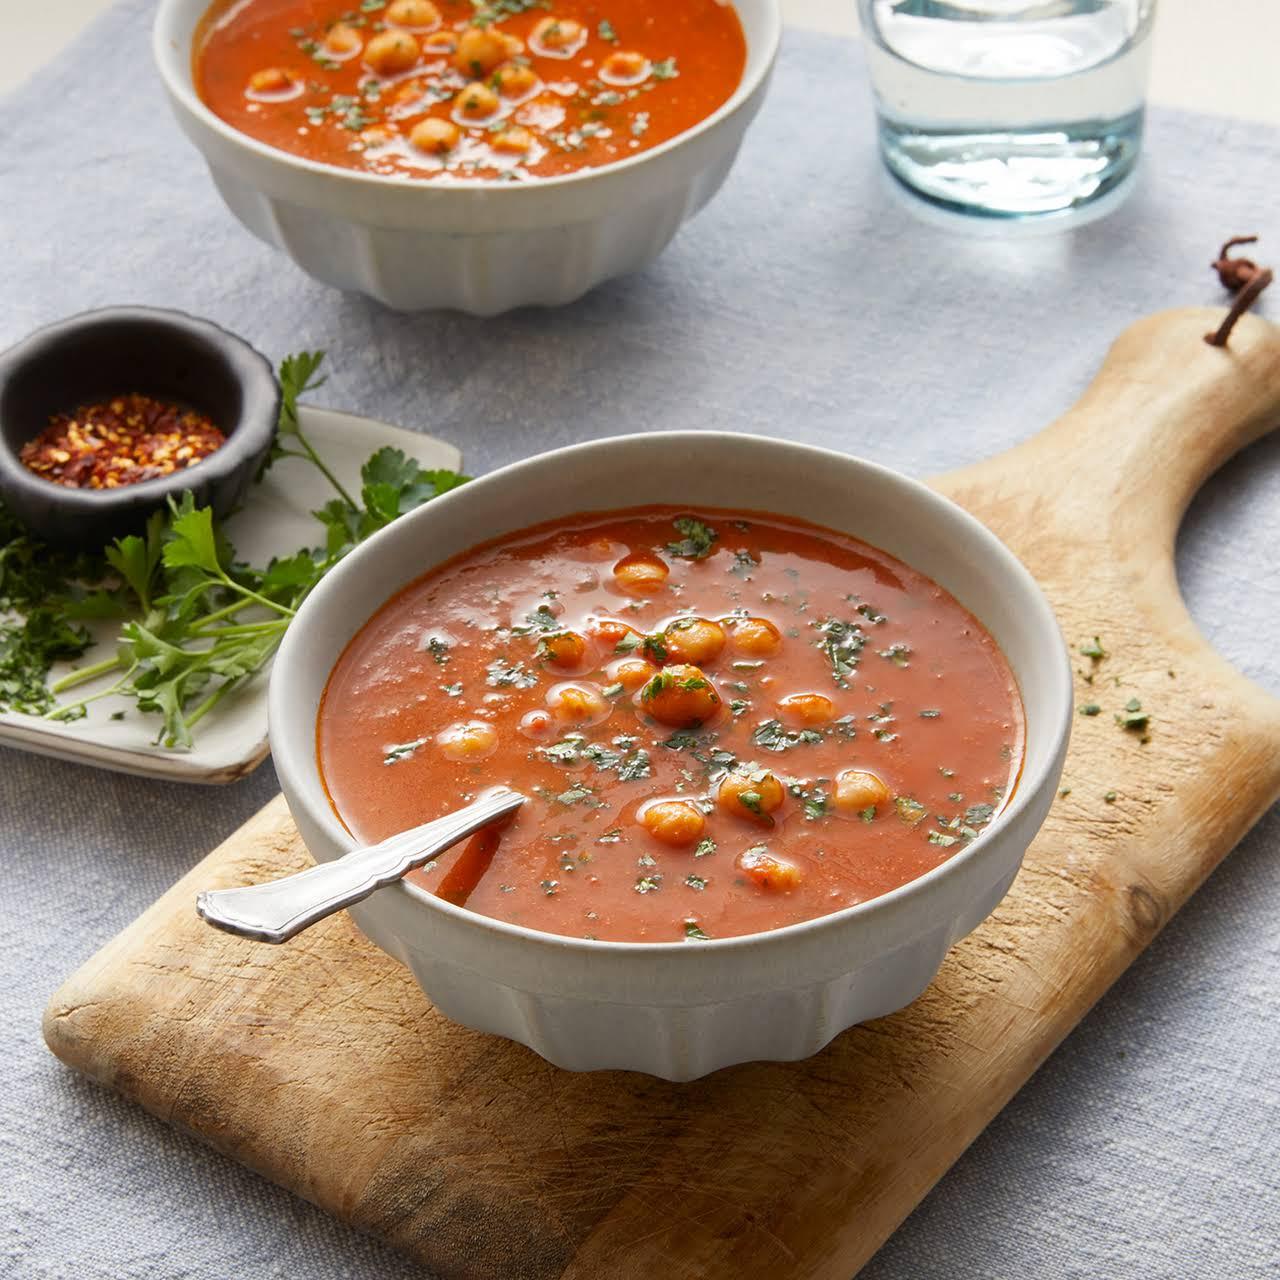 pork chop recipes using tomato soup lh2.googleusercontent.com/M_BFoDgBV2uSaBYAIlXQLxxj